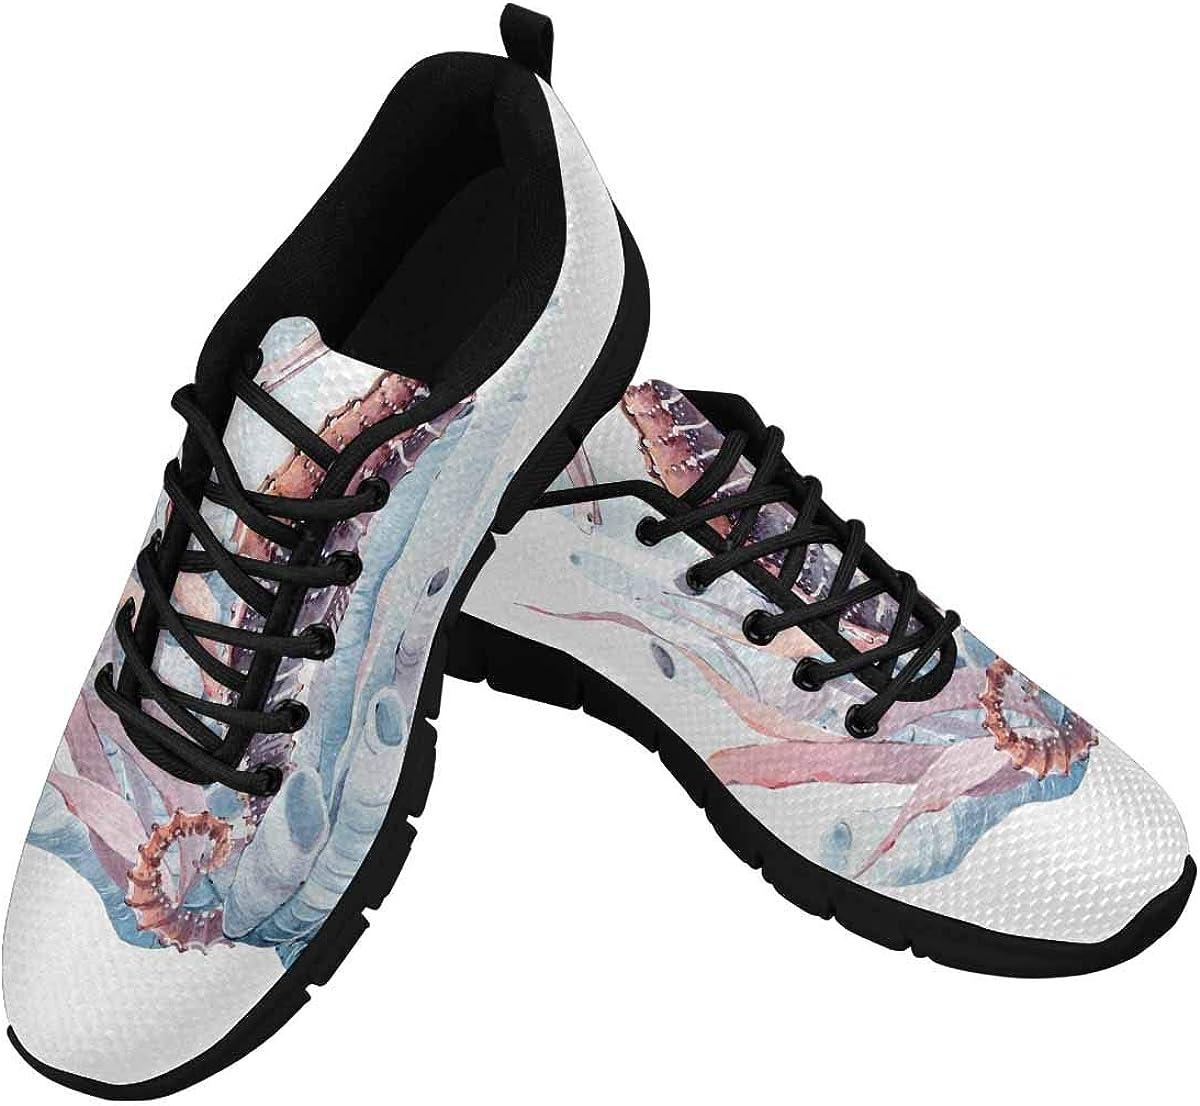 InterestPrint Hand Drawn Watercolor Seahorse Women's Athletic Walking Shoes Comfort Mesh Non Slip